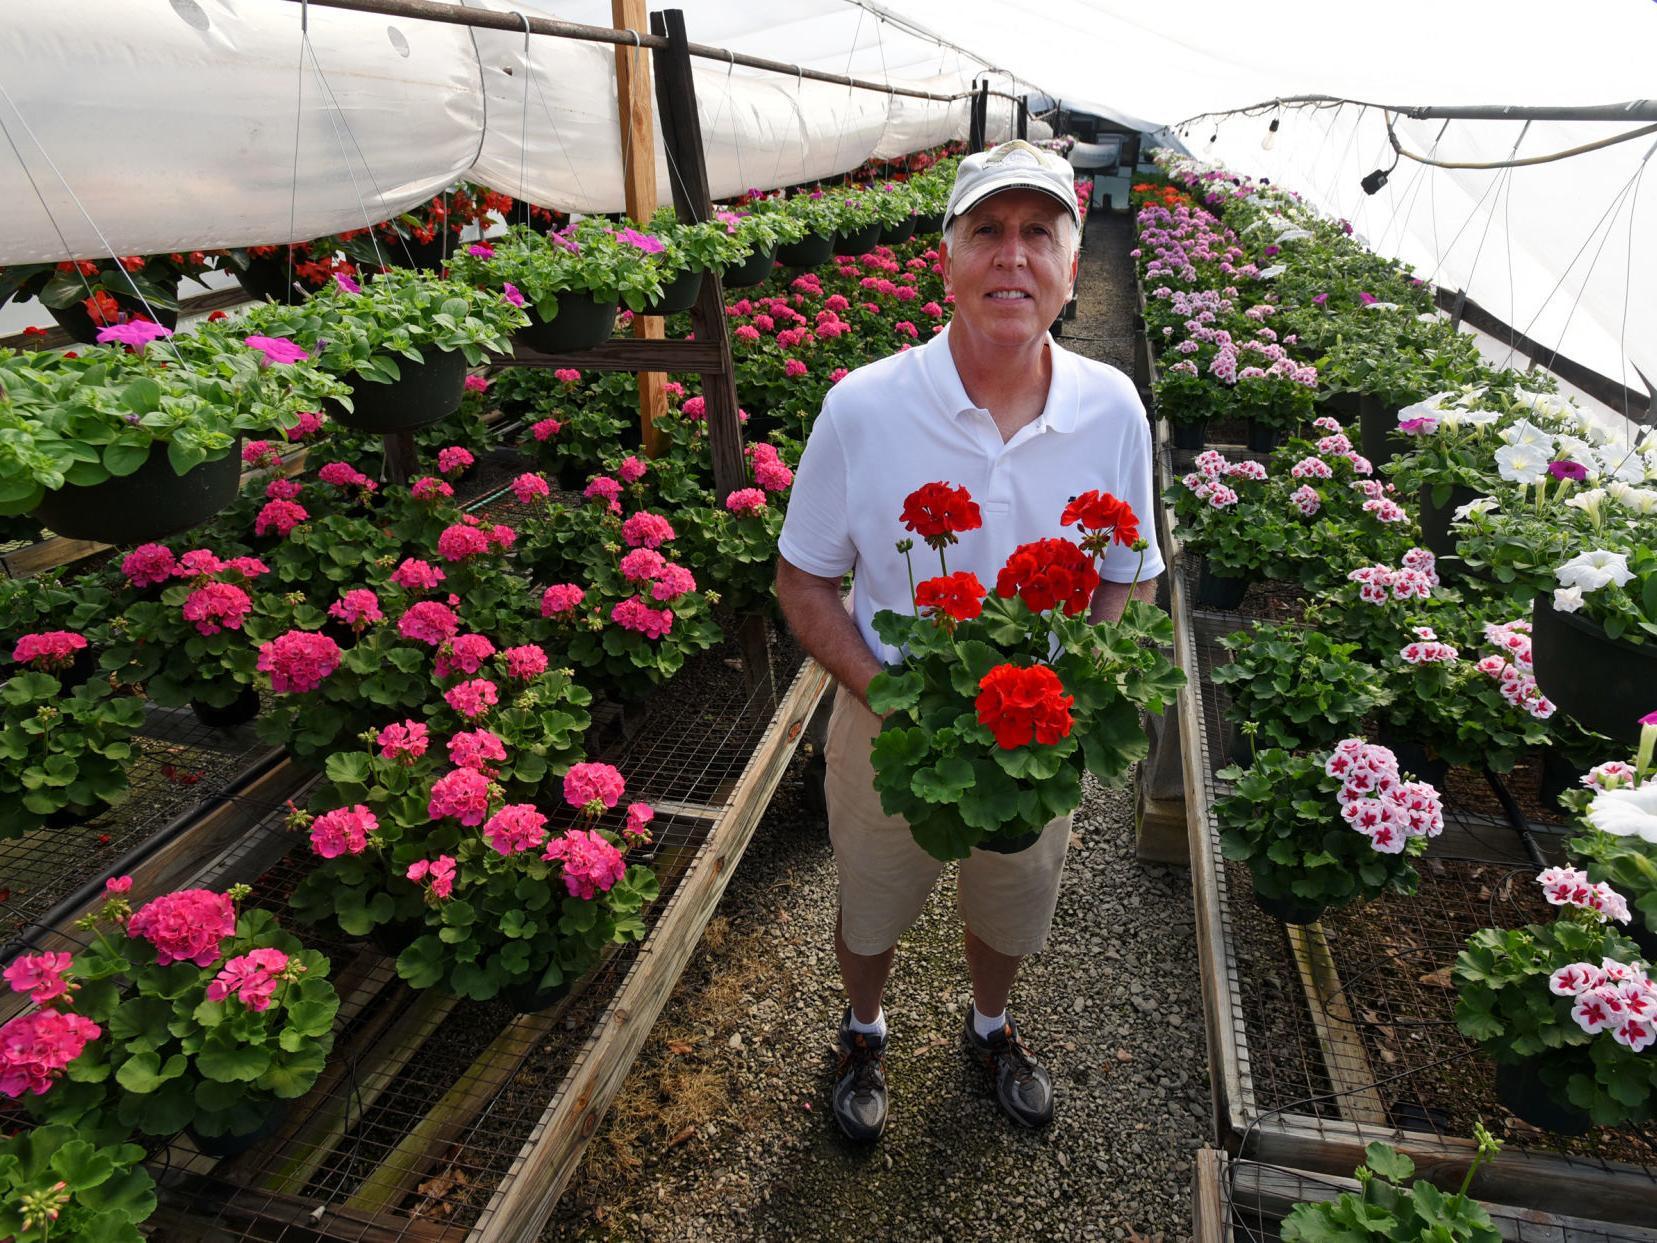 Garden Centers Respond To Covid 19